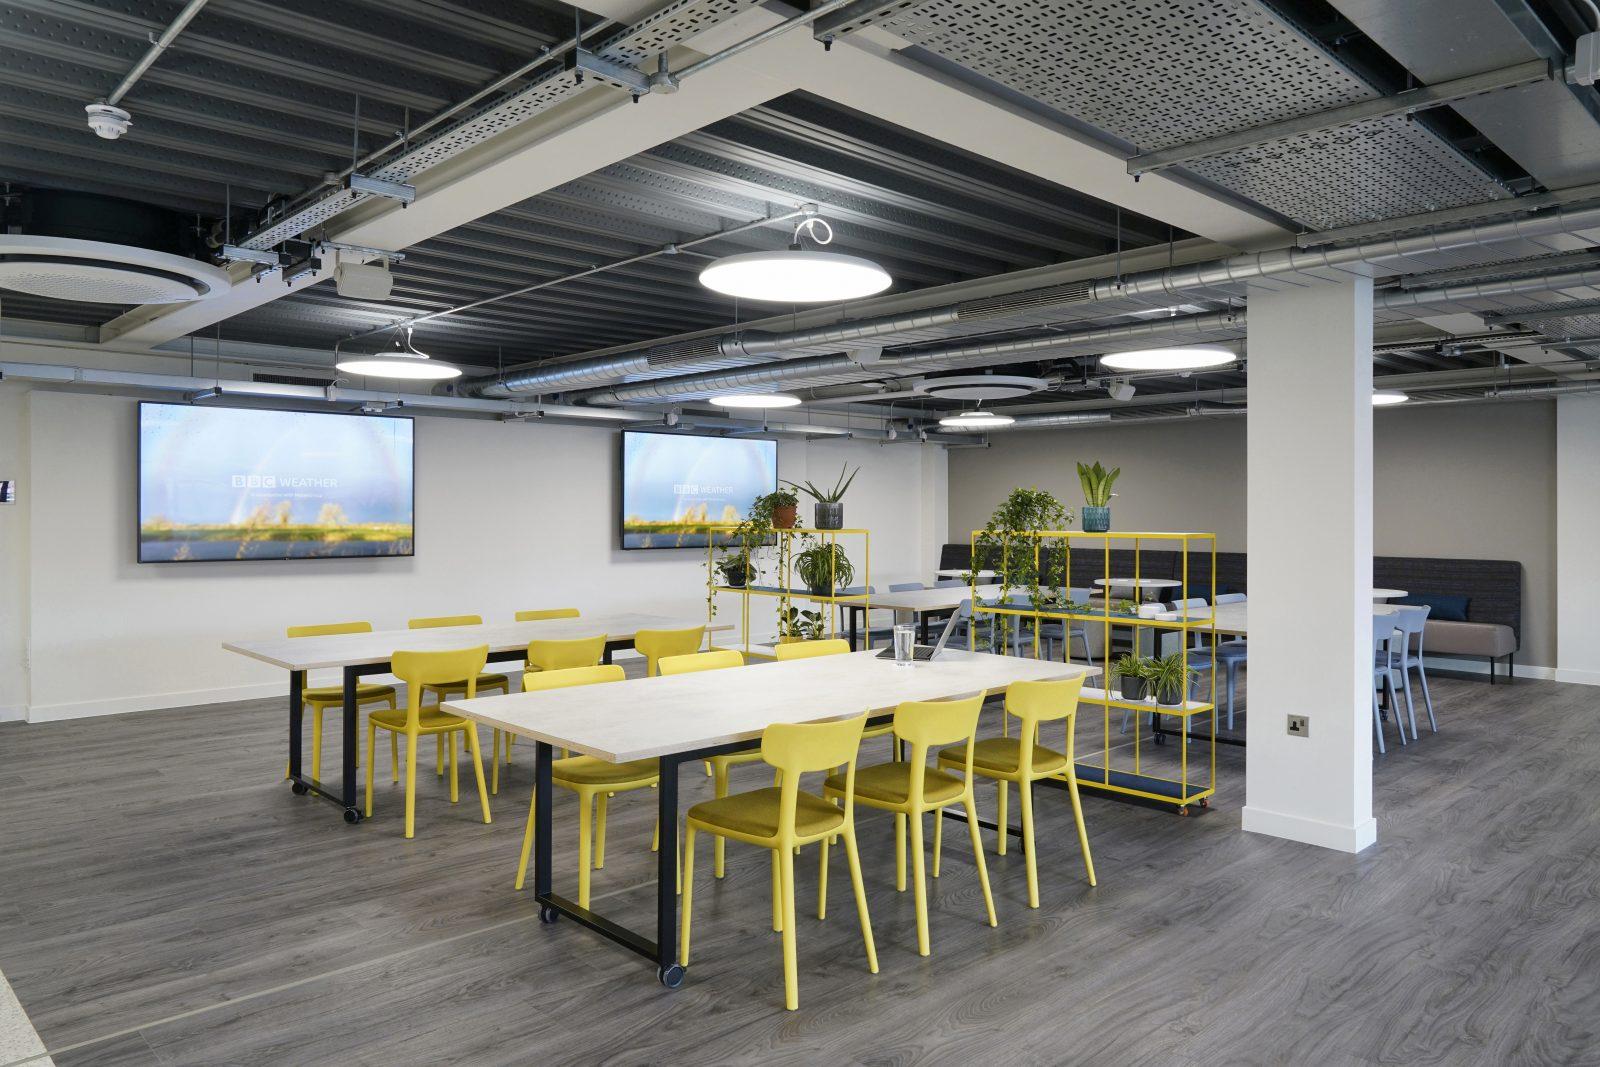 Connection Global Biotechnology Company case study Canova work cafe furniture